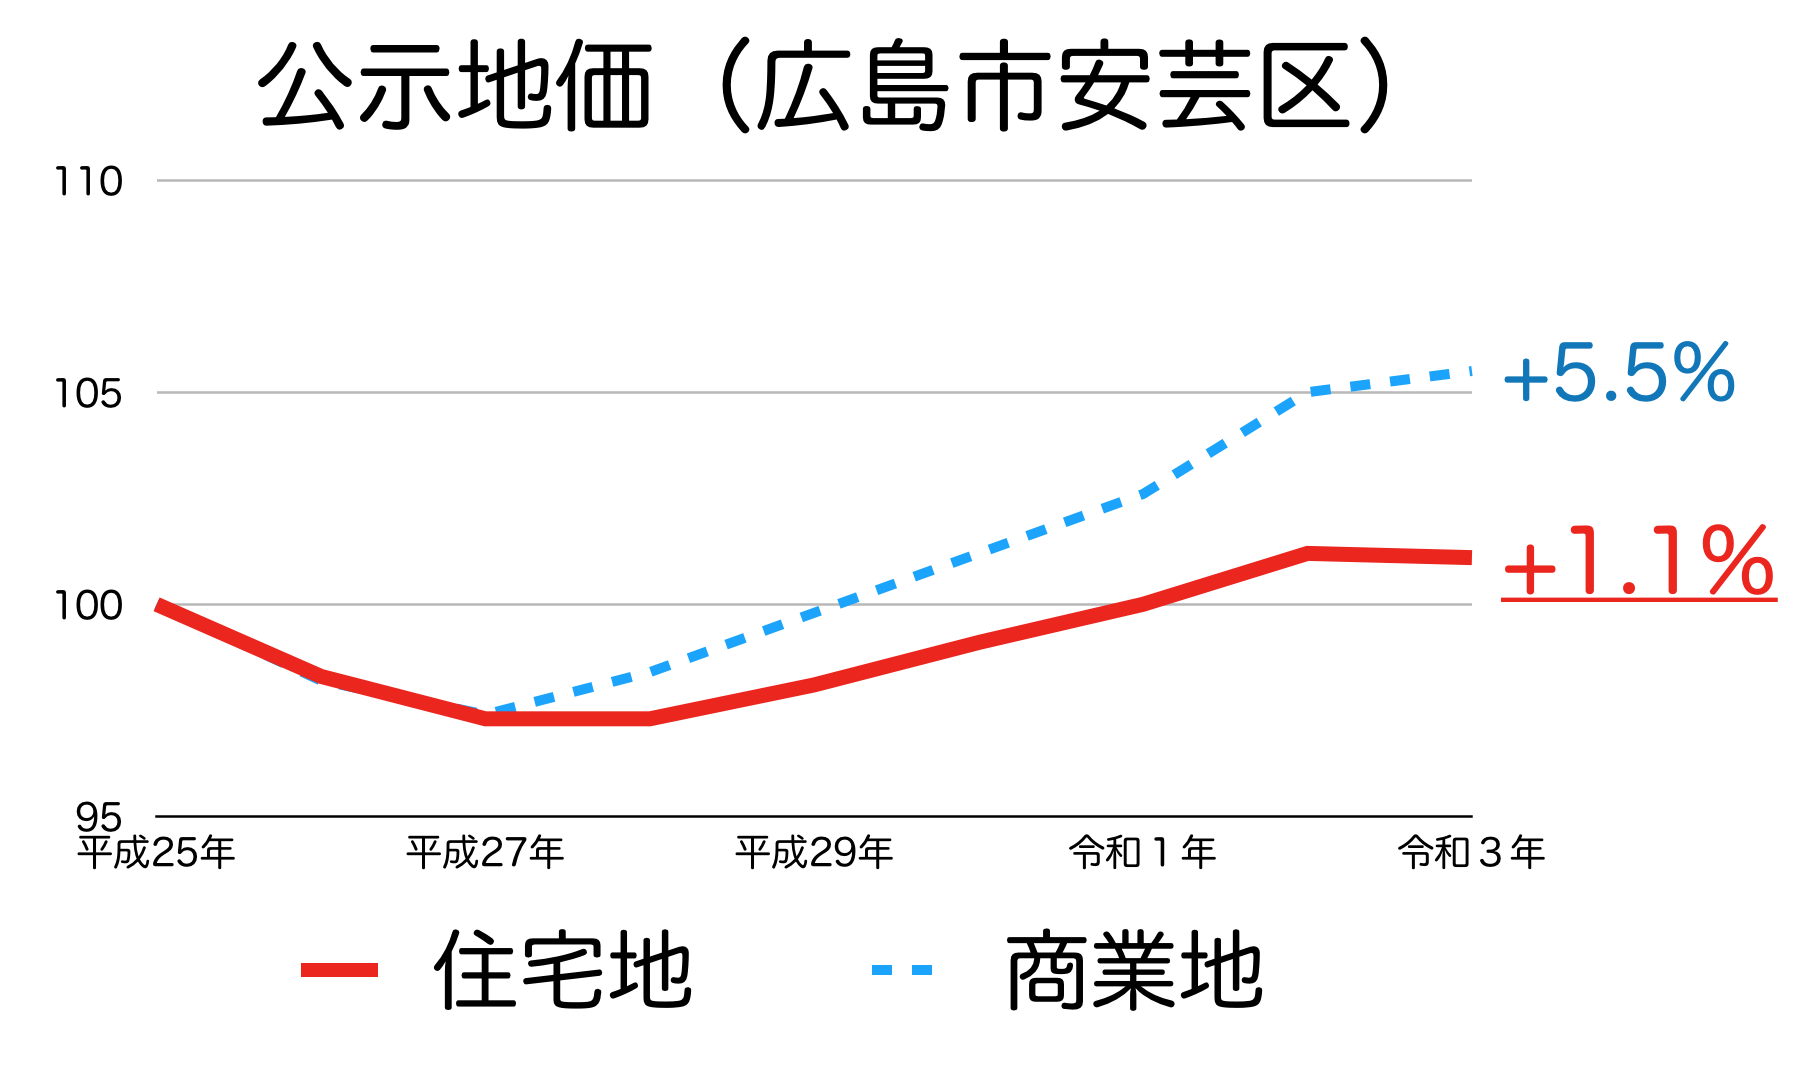 広島市安芸区の公示地価の推移